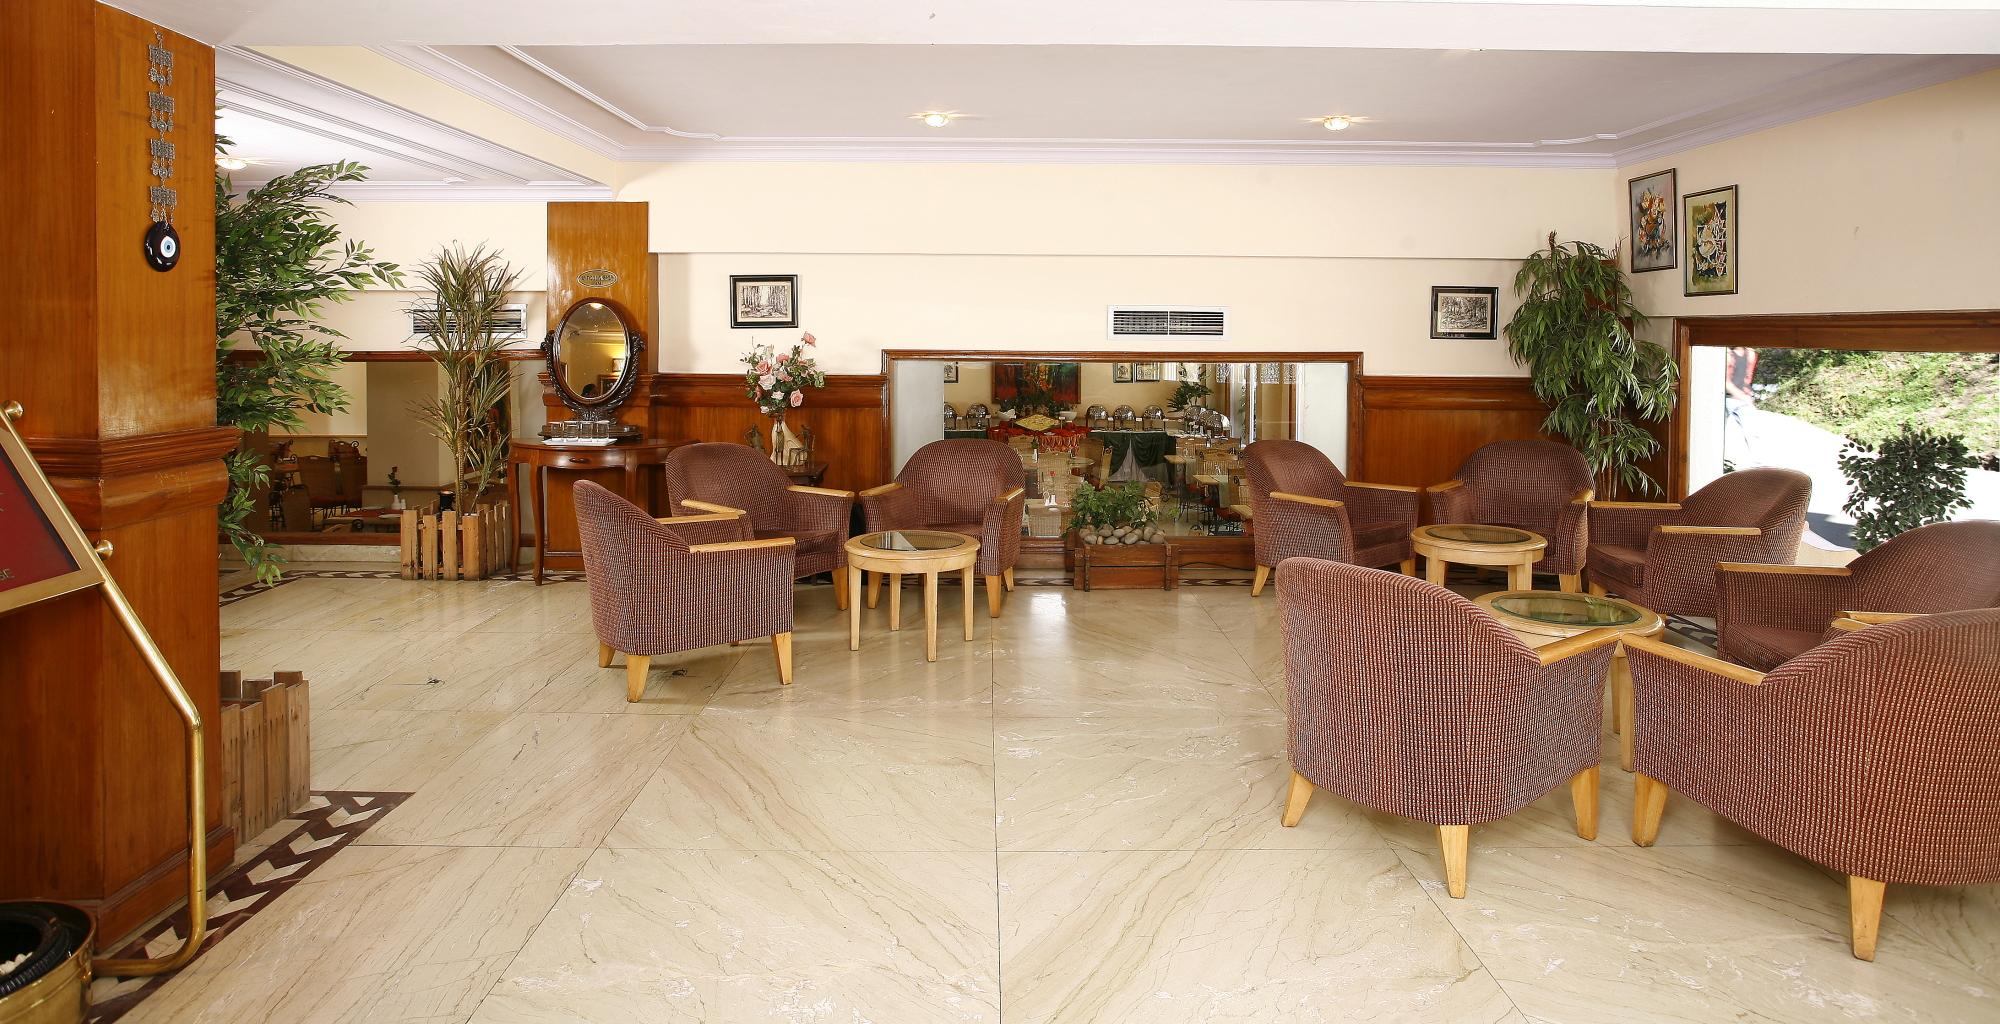 hotel willow banks shimla_10479net wix